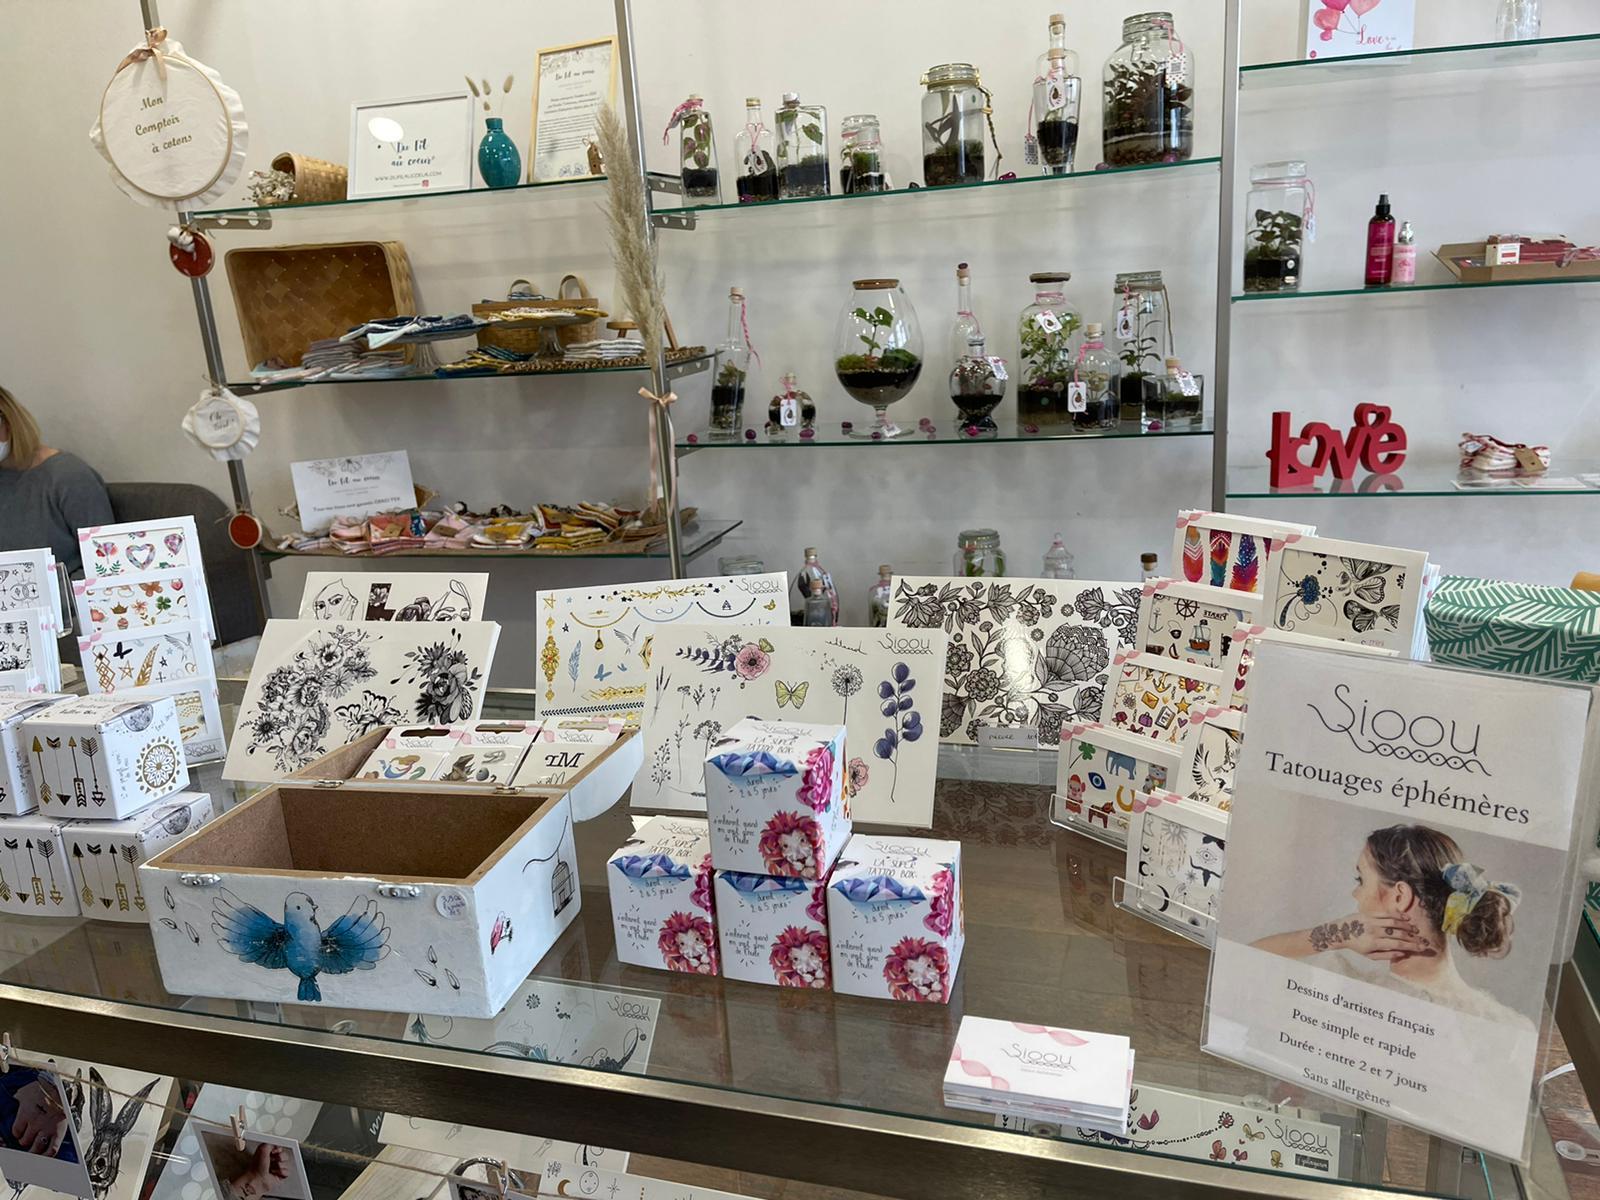 boutique éphémère Lyon tattoos Sioou